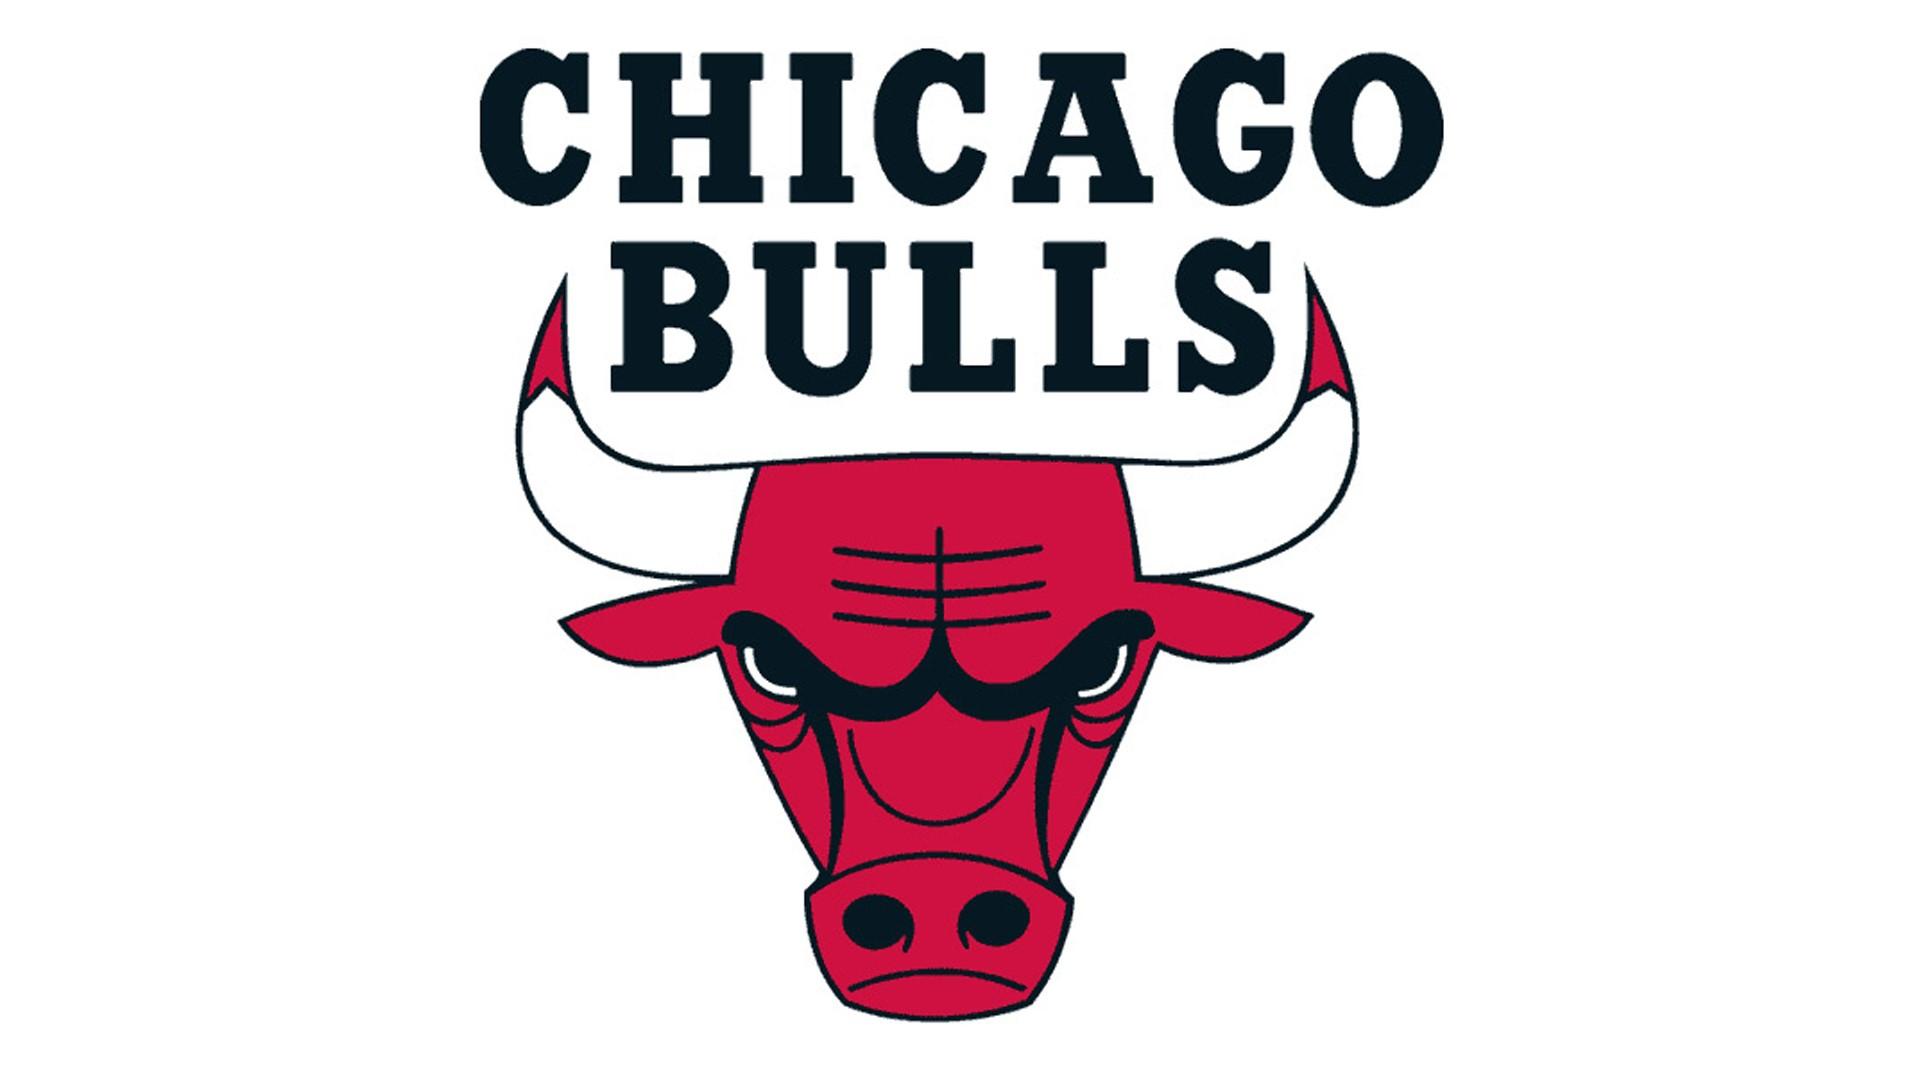 Chicago Bulls Pictures